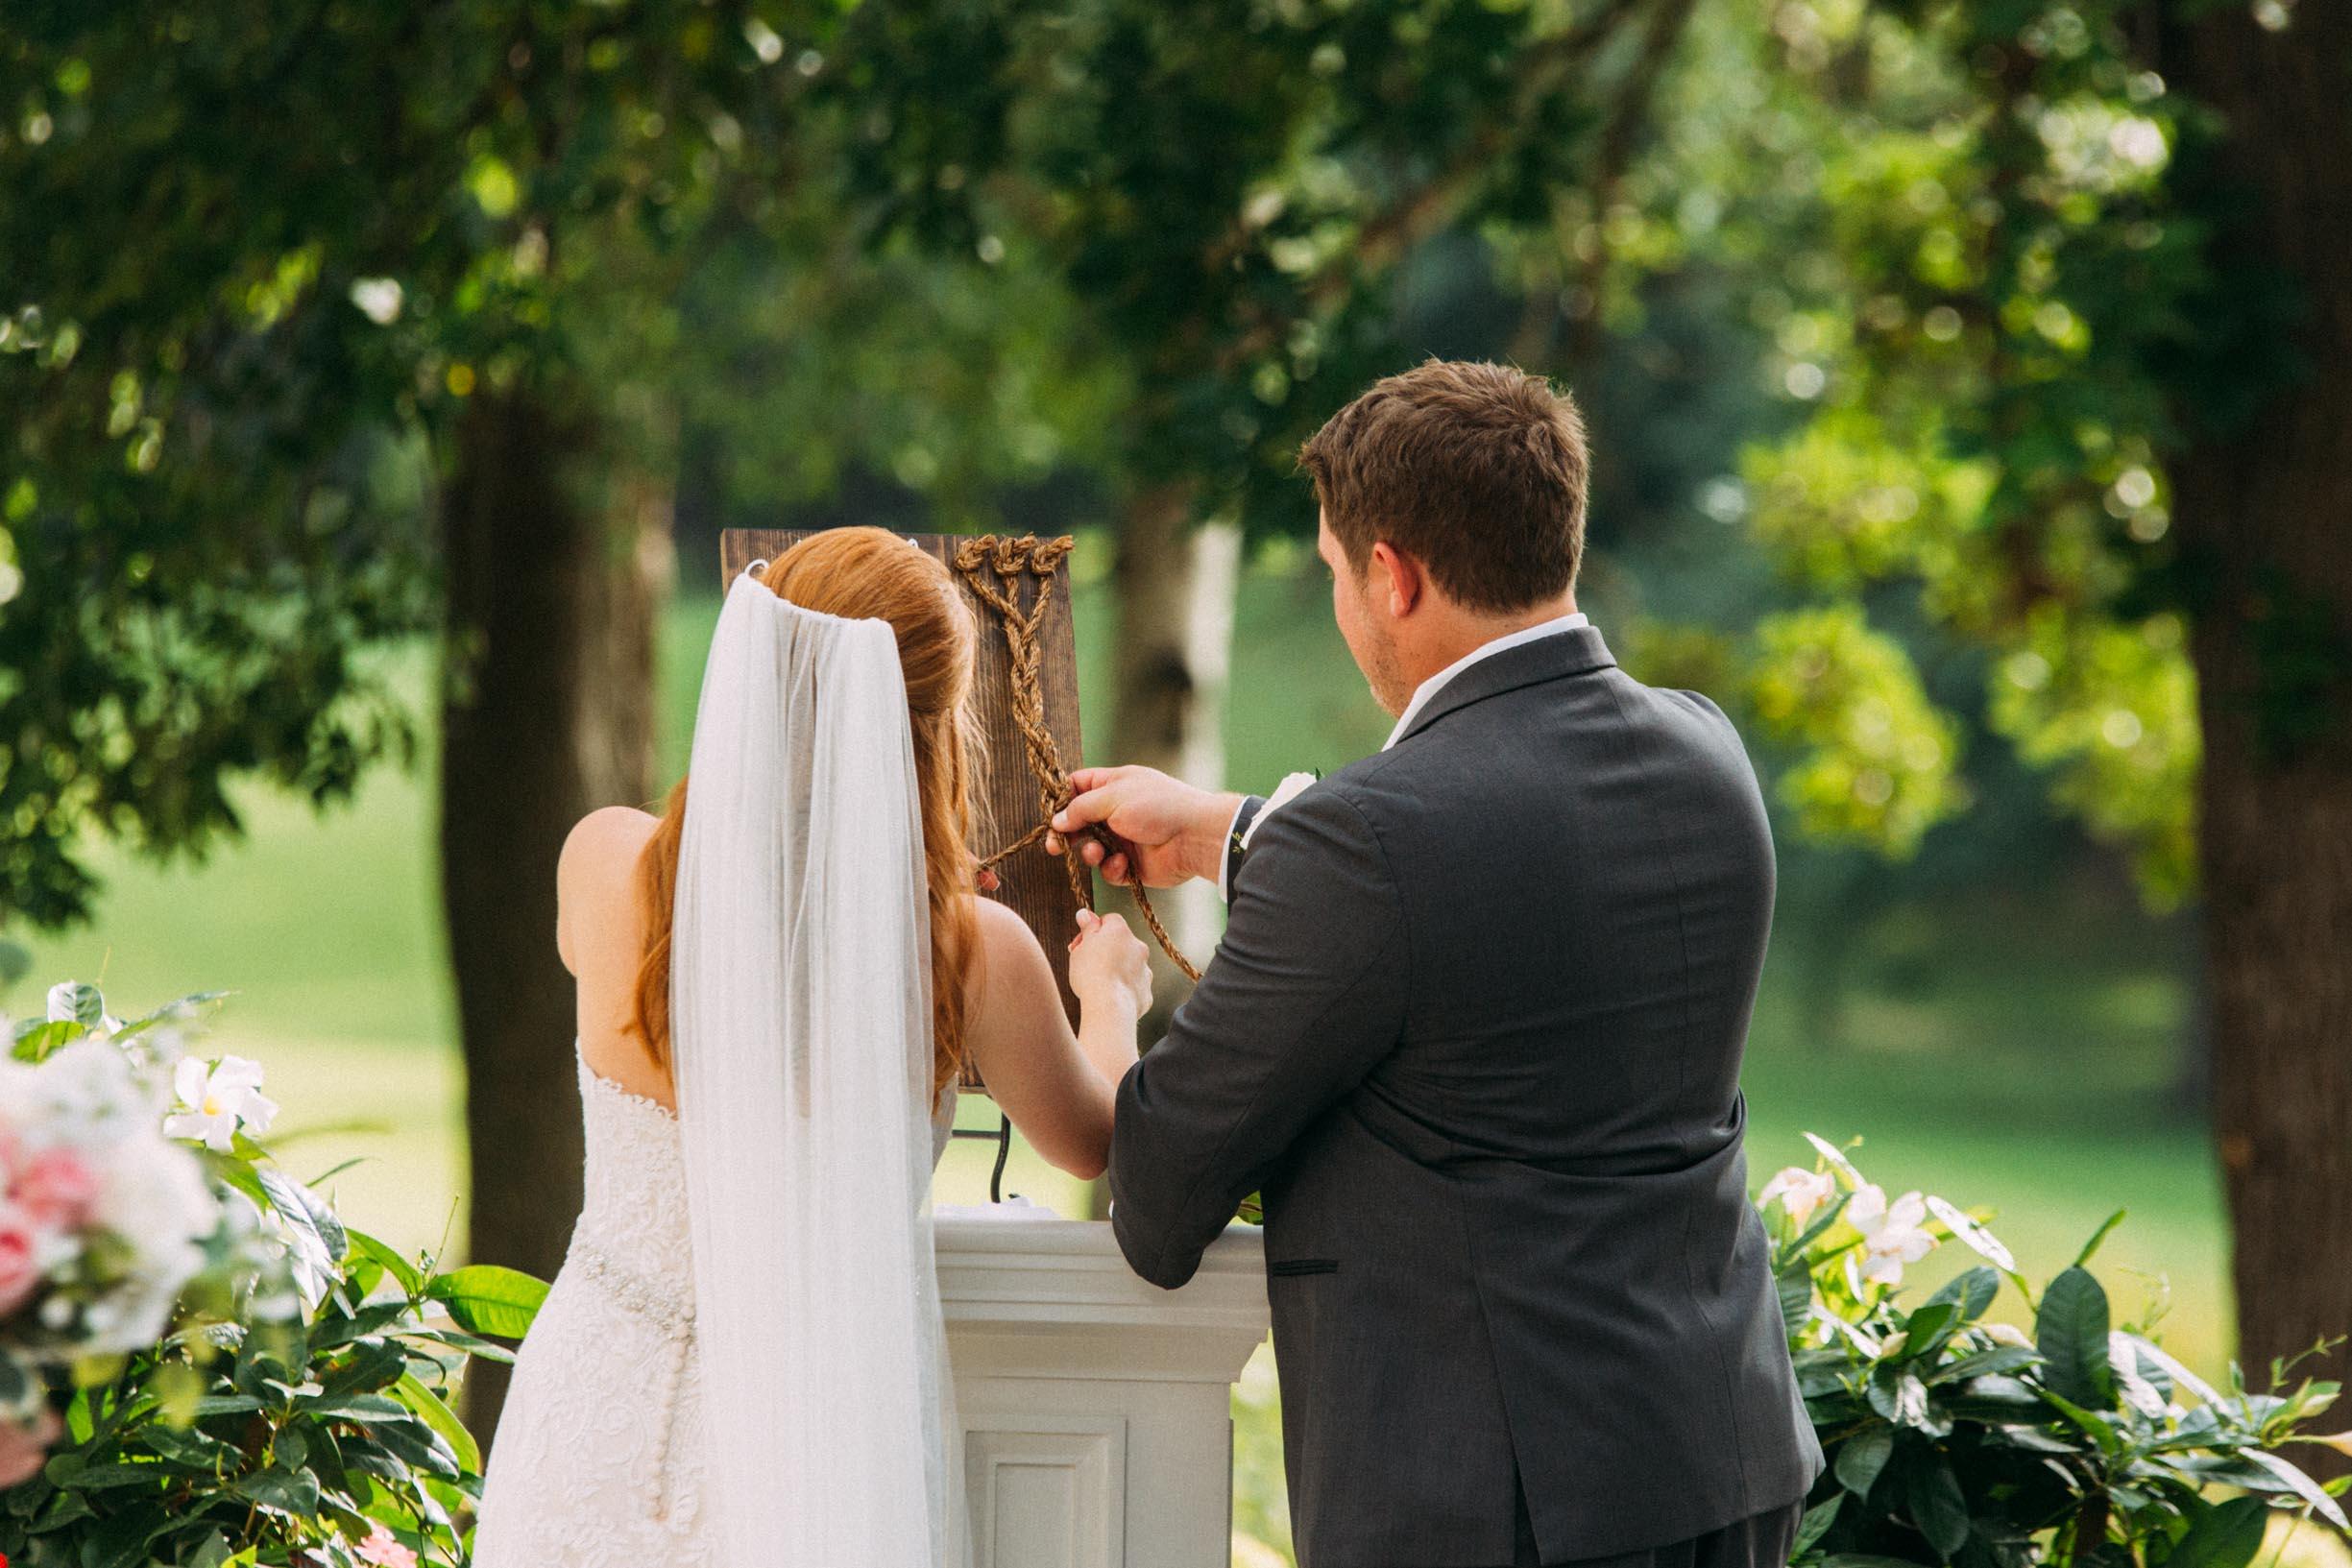 Megan_Zach_Minneapolis_Wedding_Ceremony_Blog-37.jpg